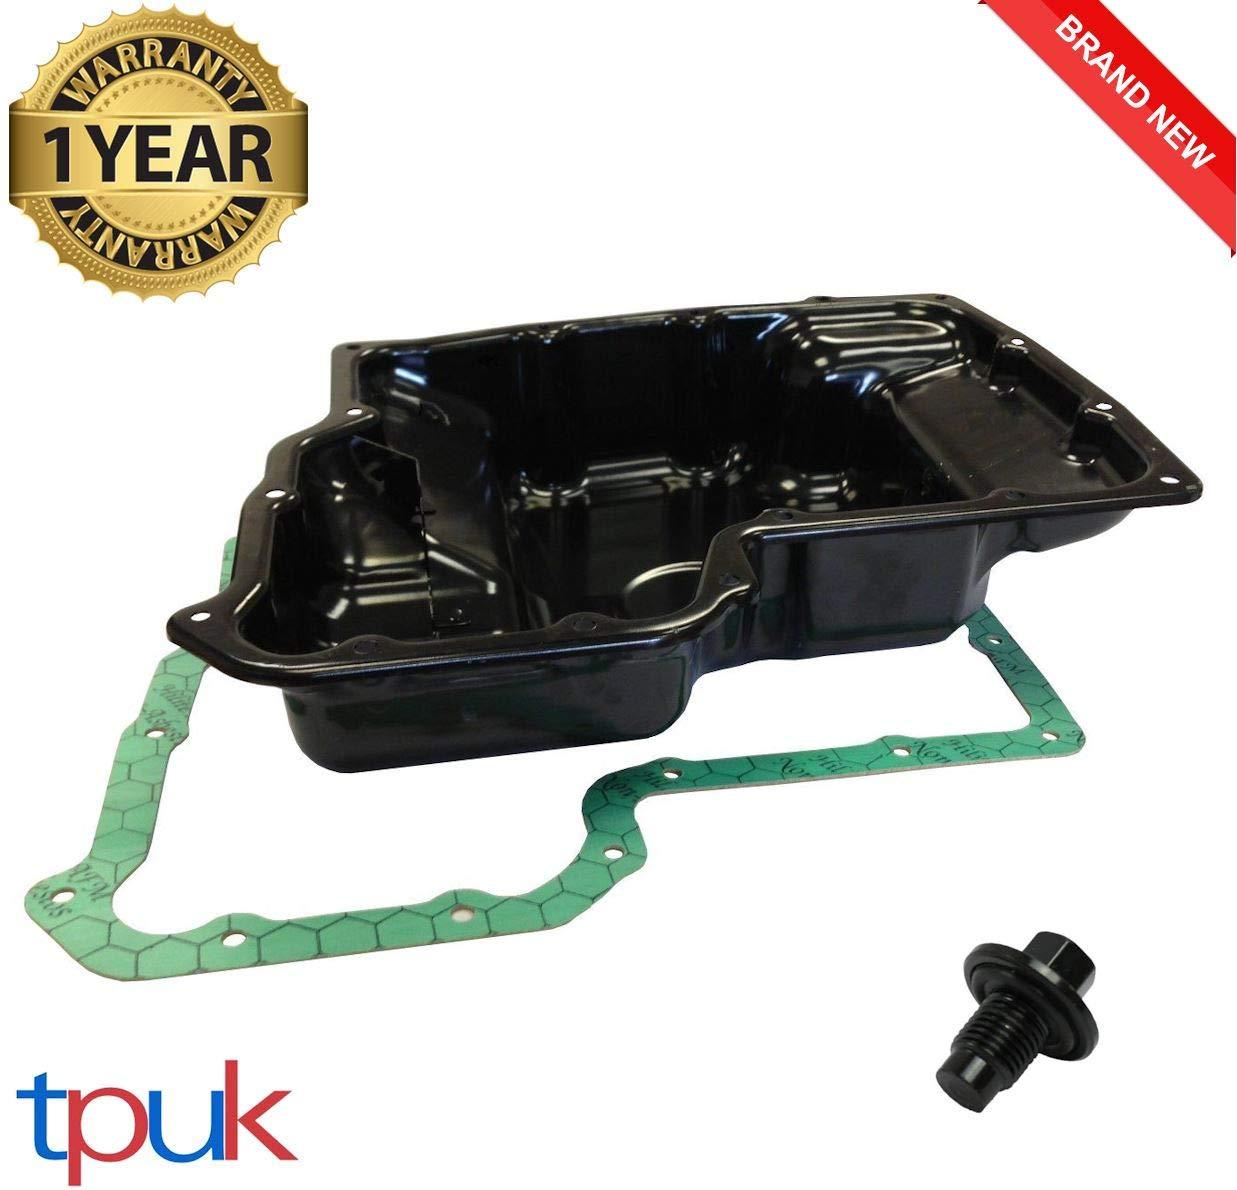 TRANSIT MK6 MK7 2.0 2.2 FWD OIL SUMP OIL SUMP PAN WITH SUMP PLUG 1706974 TPUK